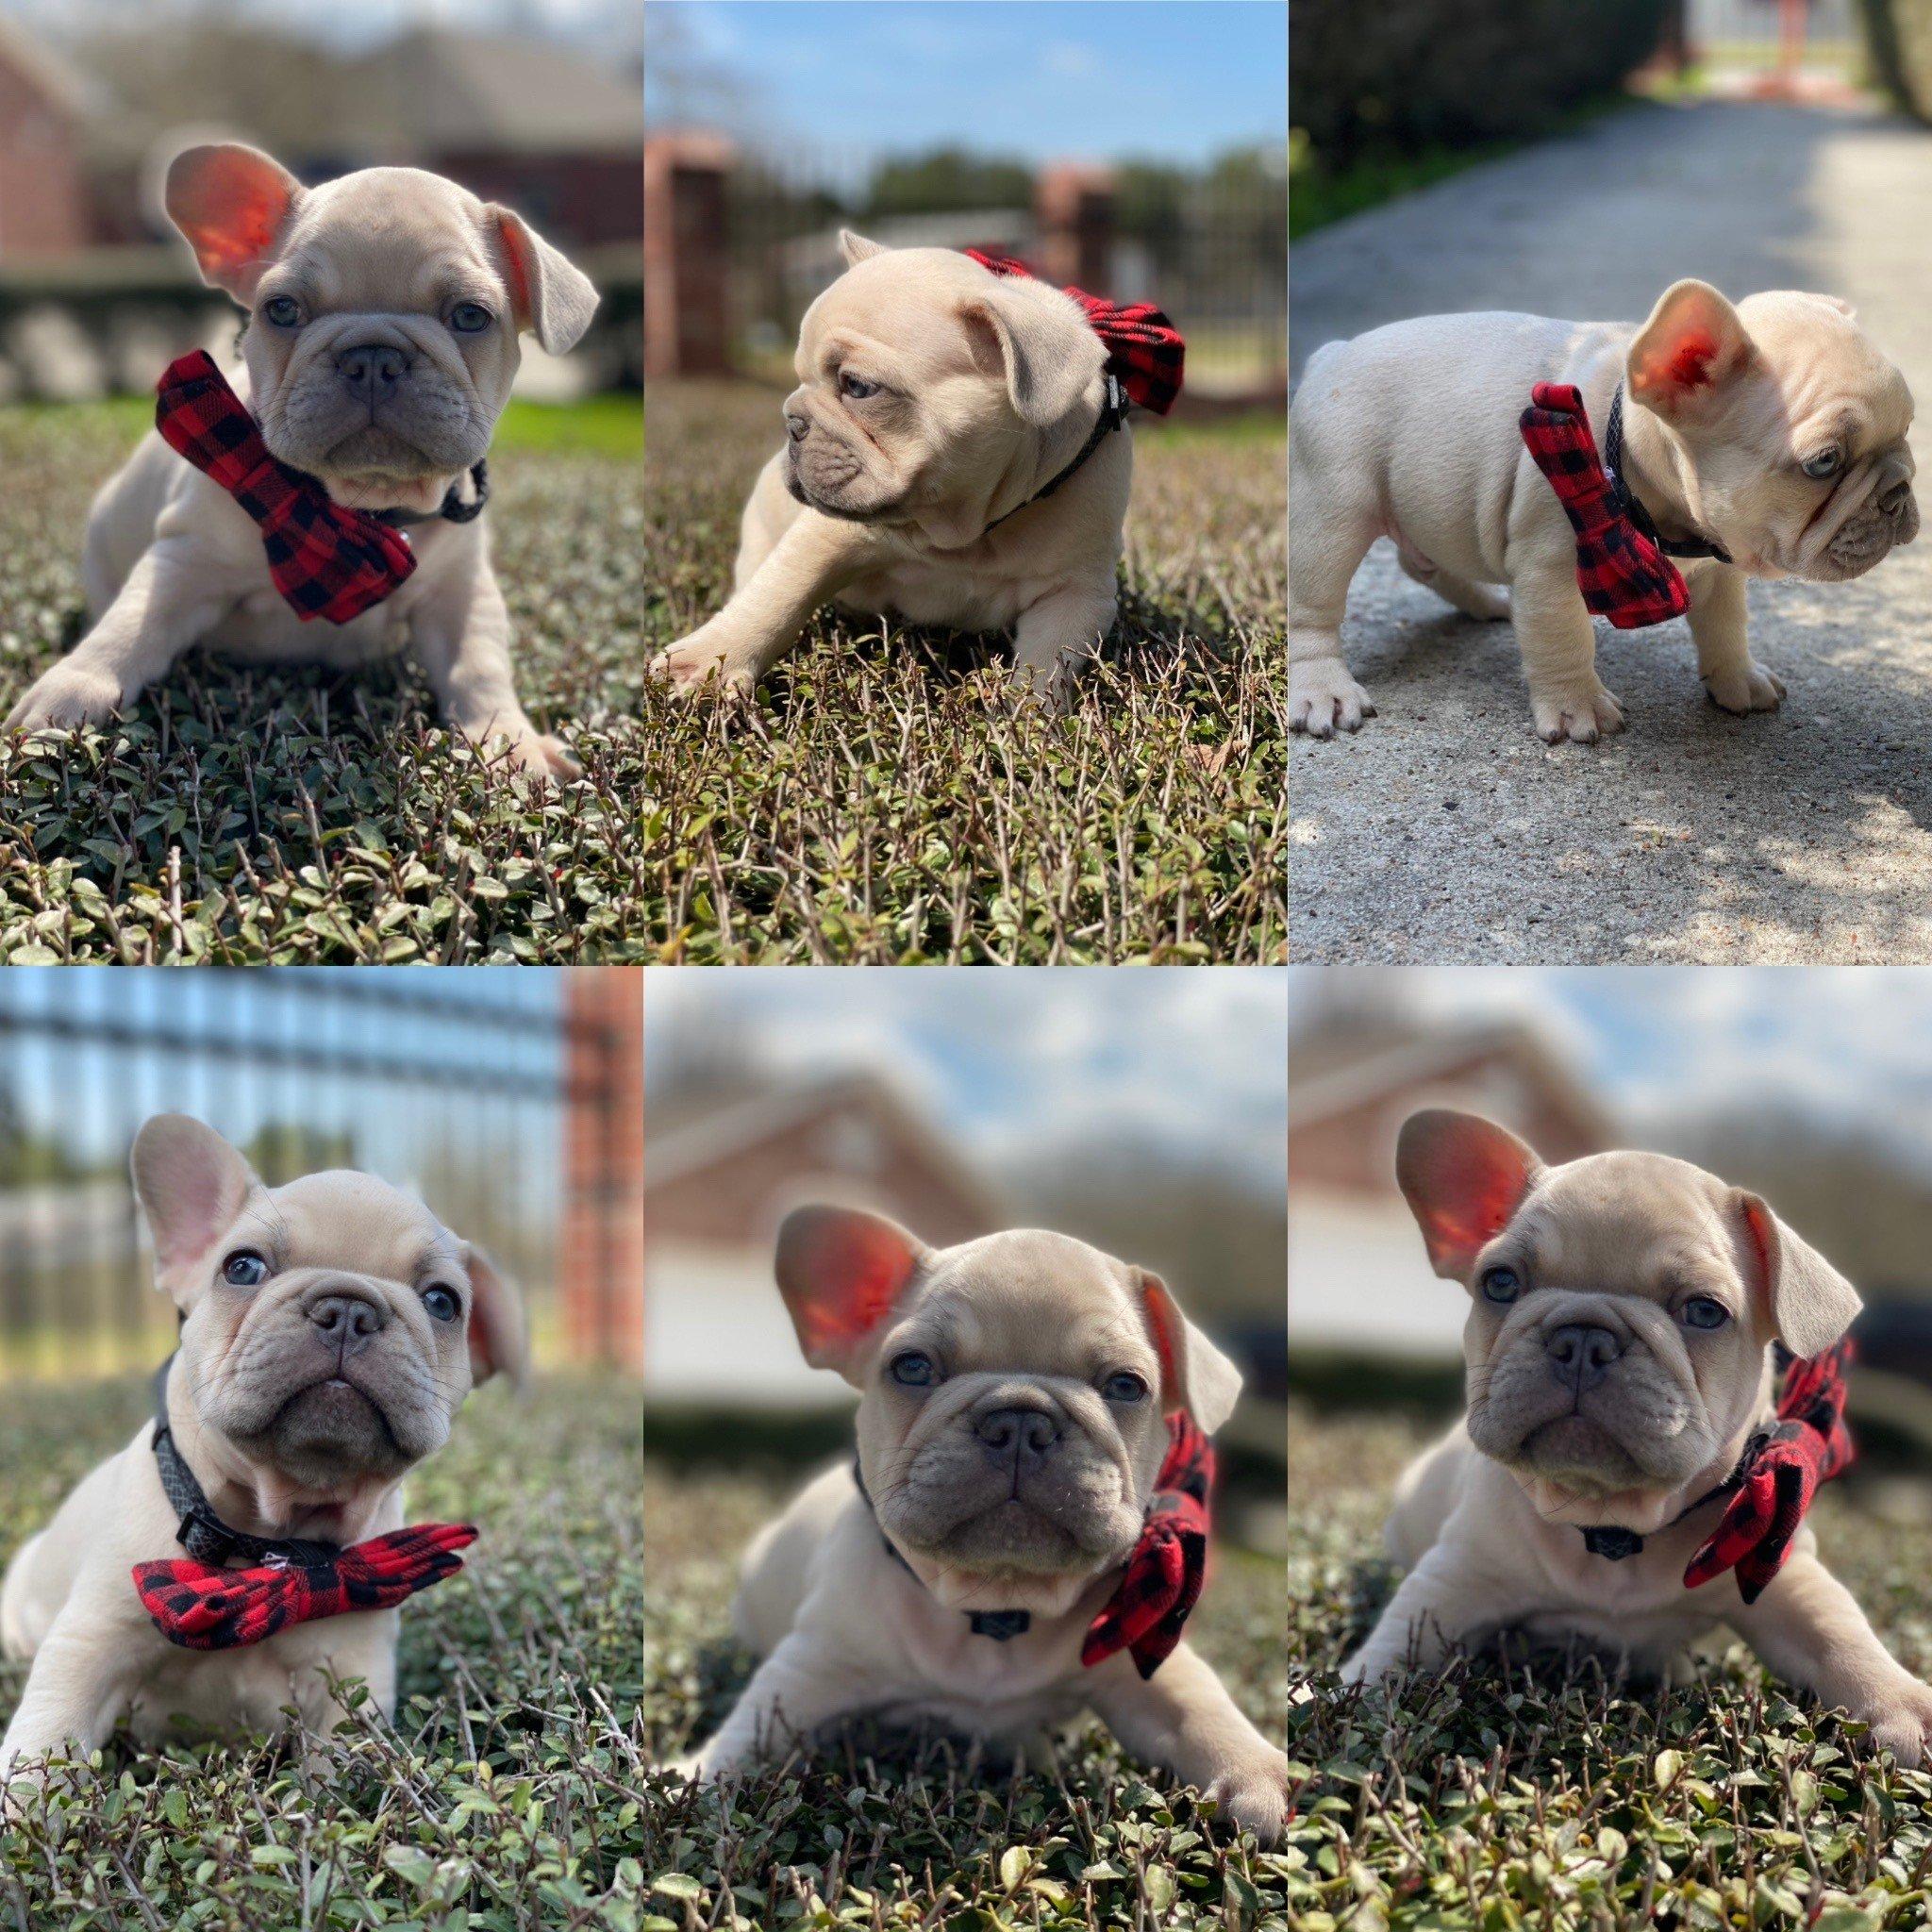 Dior - doggie AKC French Bulldog for sale at Houston, Texas